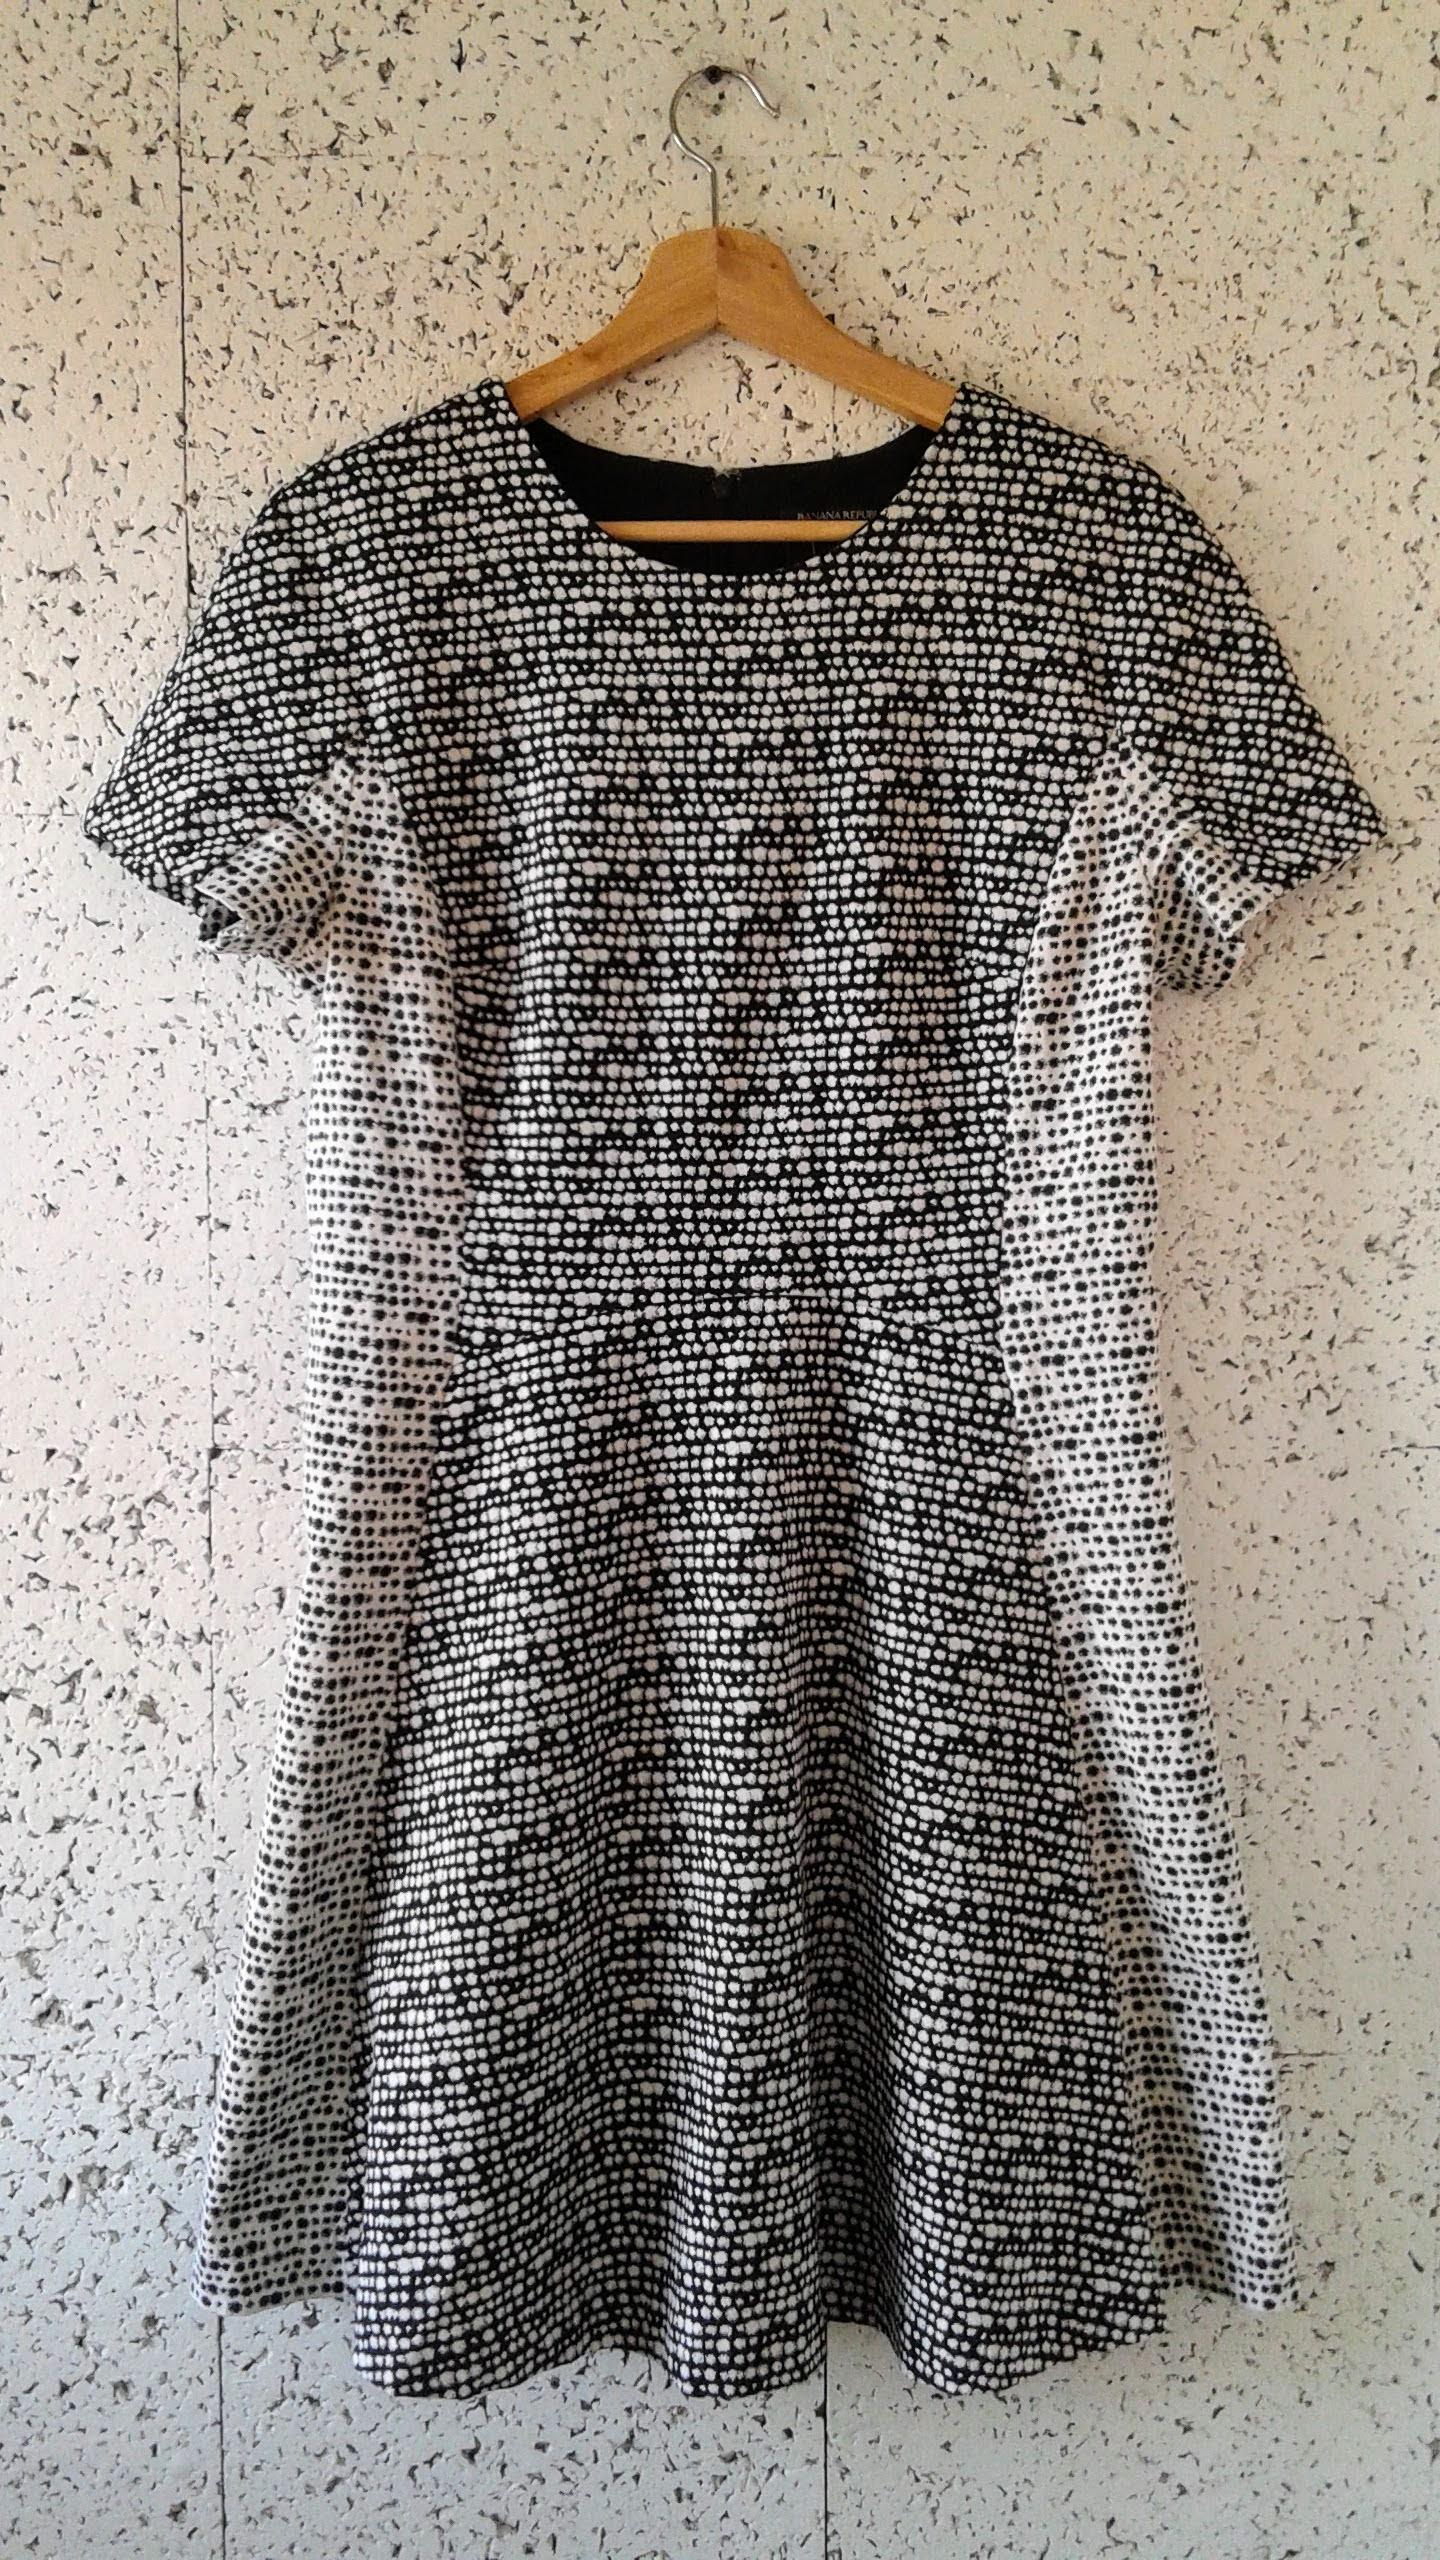 Banana Republic dress; Size 10, $42